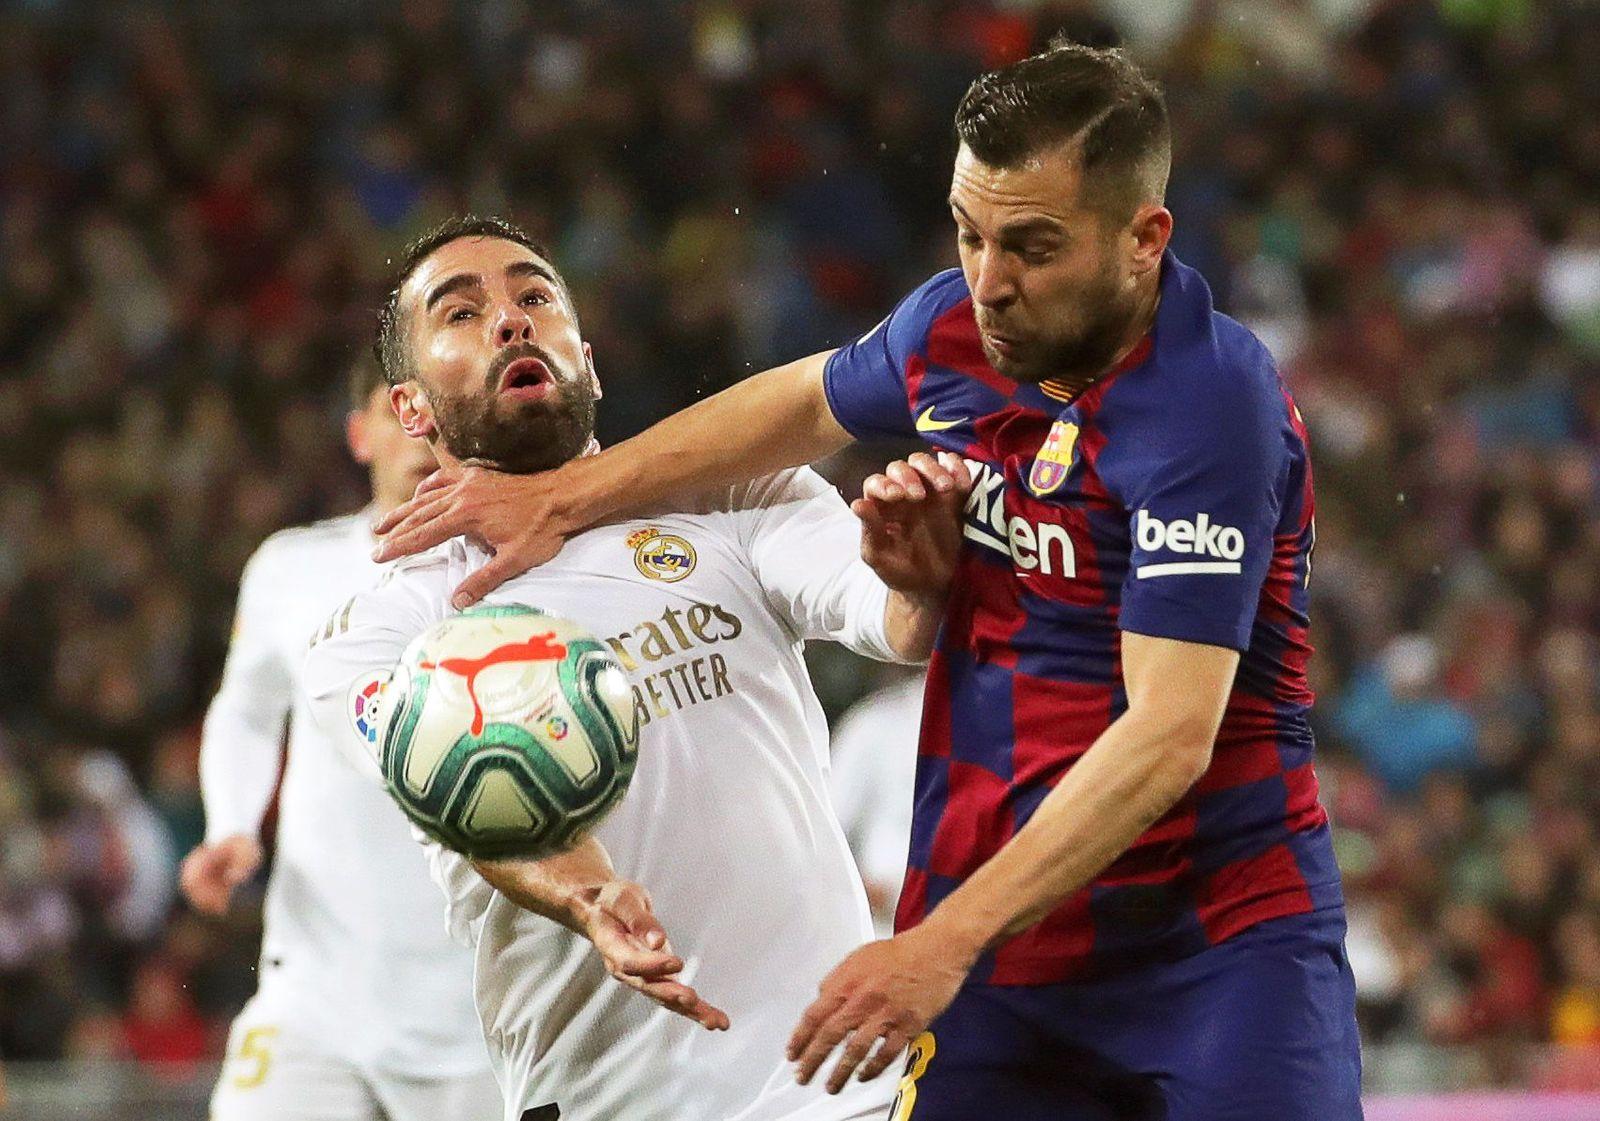 Real Madrid vs FC Barcelona, Spain - 01 Mar 2020